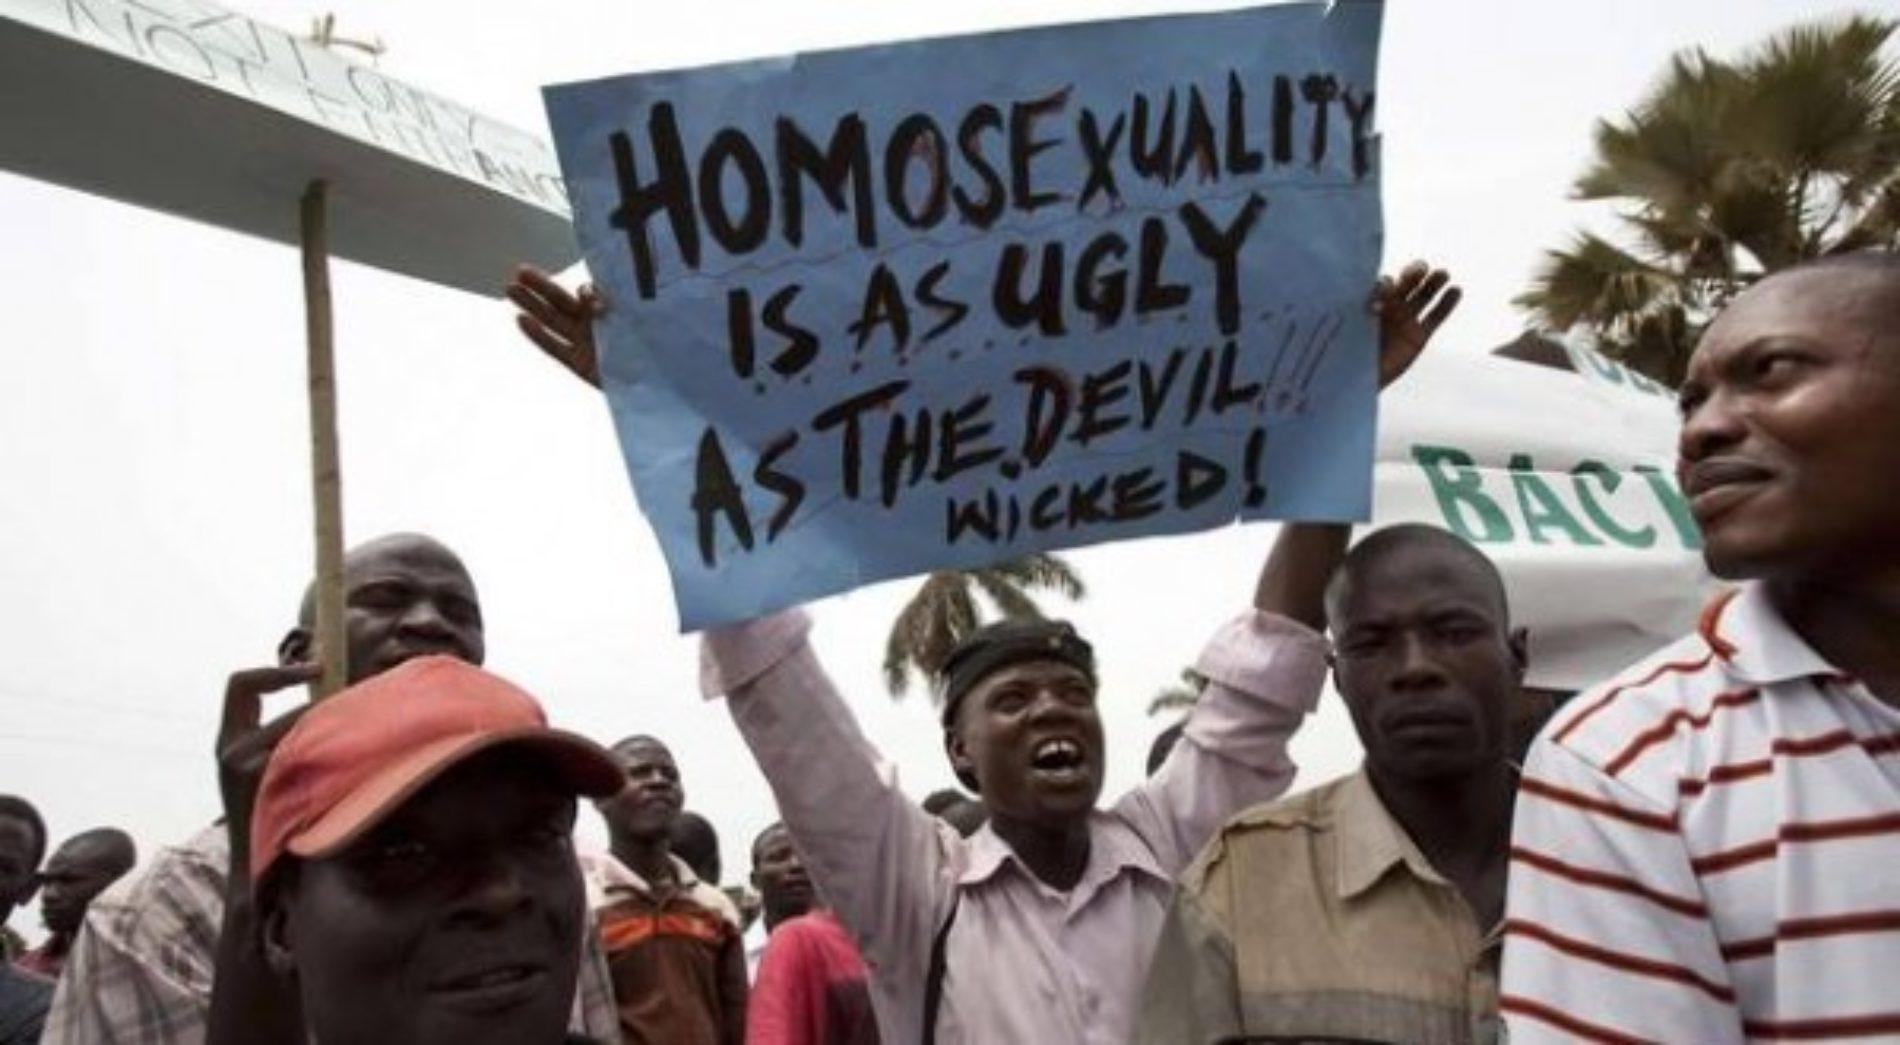 The Language of Homophobia